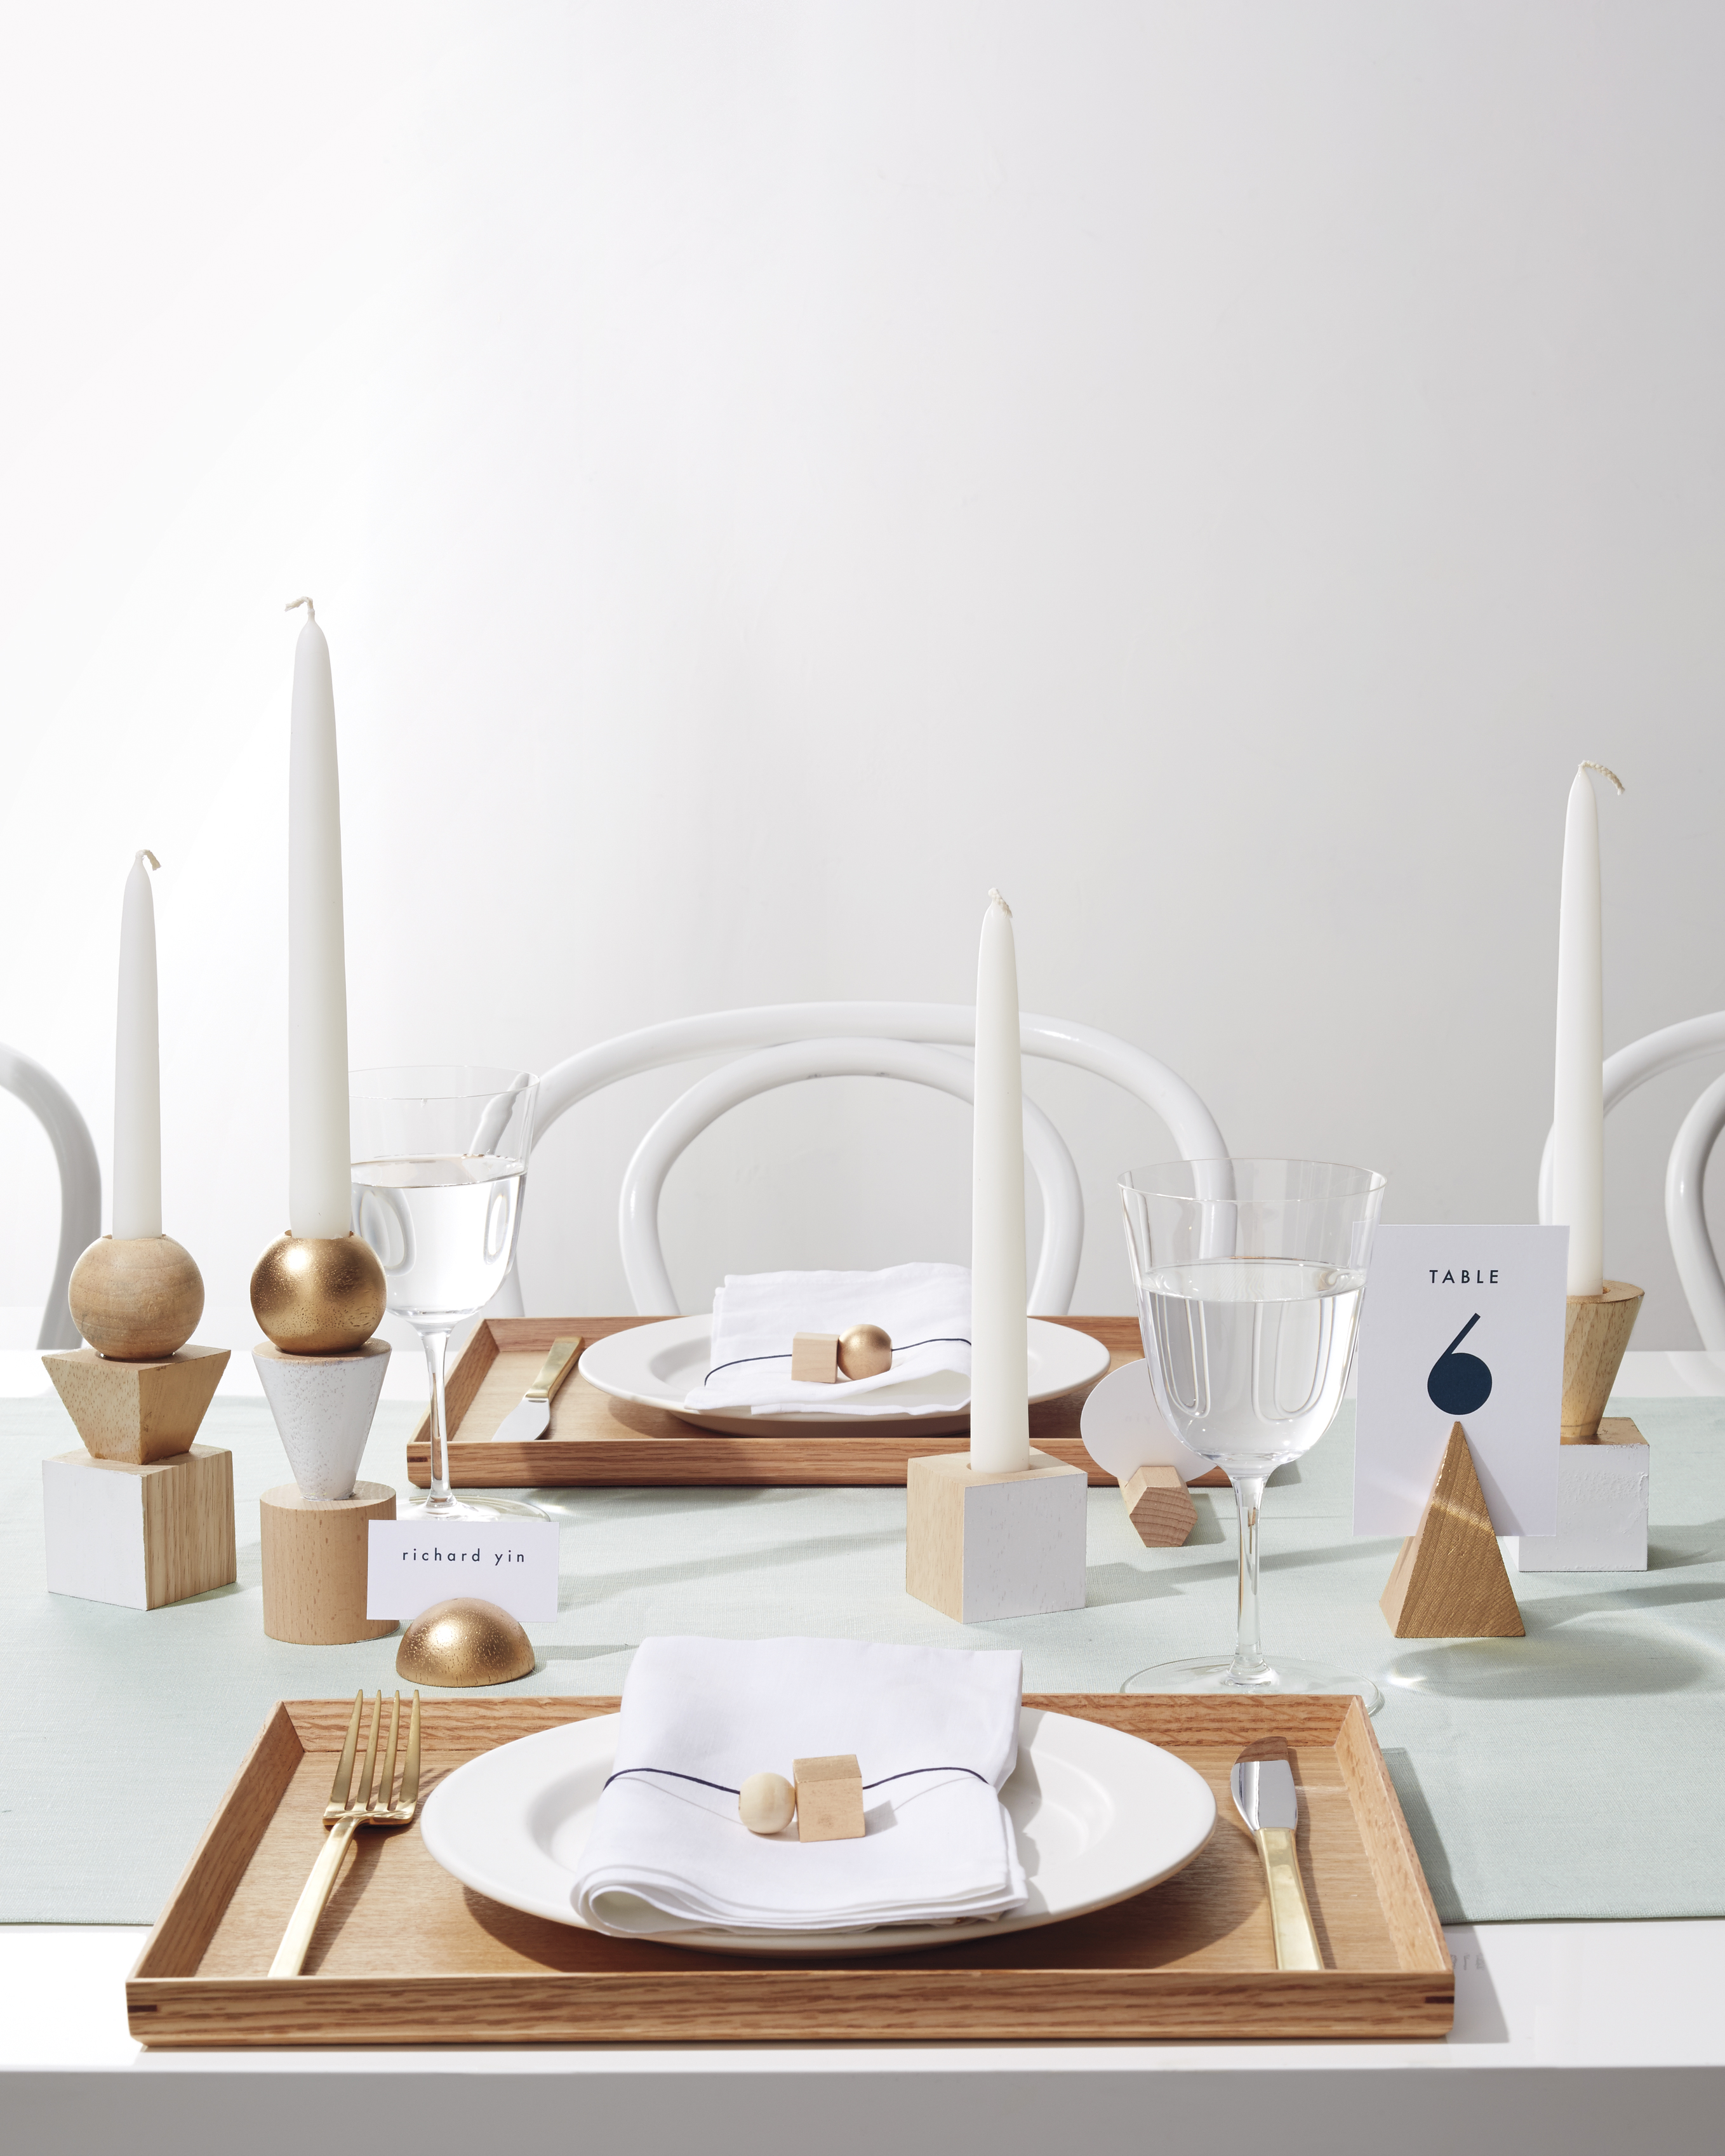 Geometric Wooden Candleholders